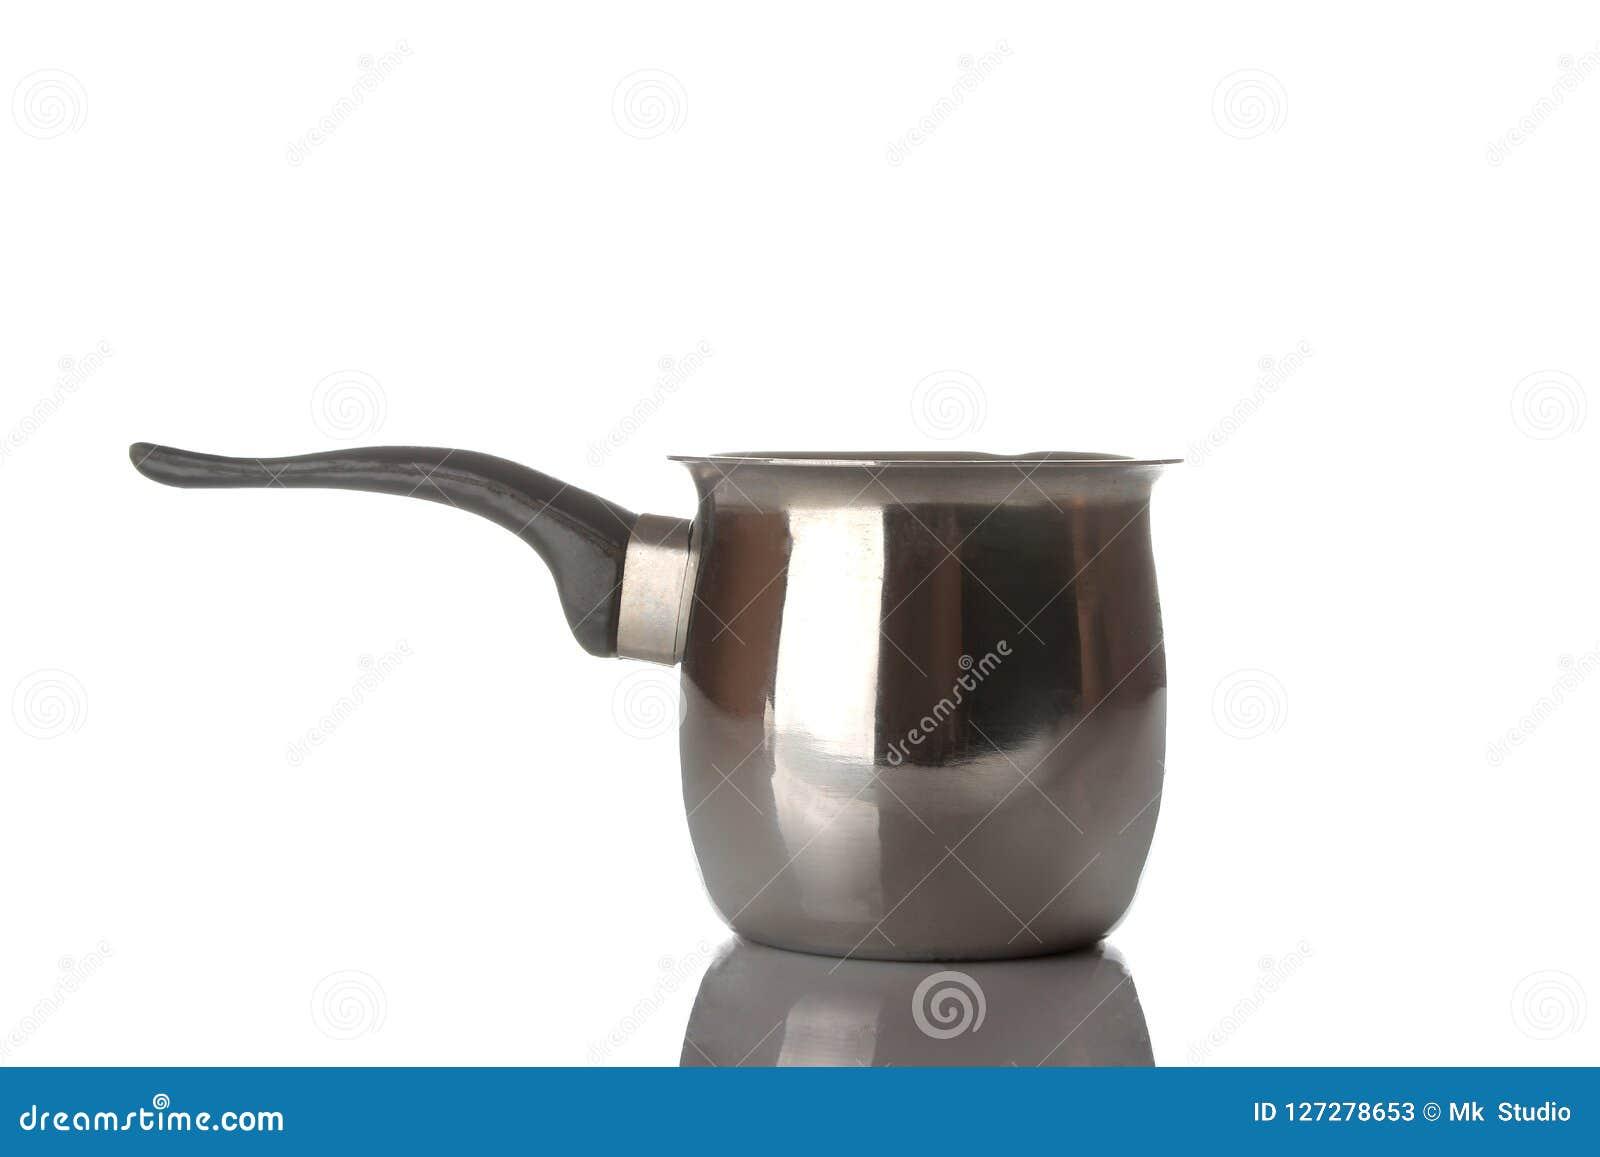 Cezve εξαρτήματα για τον καφέ συγκόλλησης απομονωμένο στο λευκό υπόβαθρο